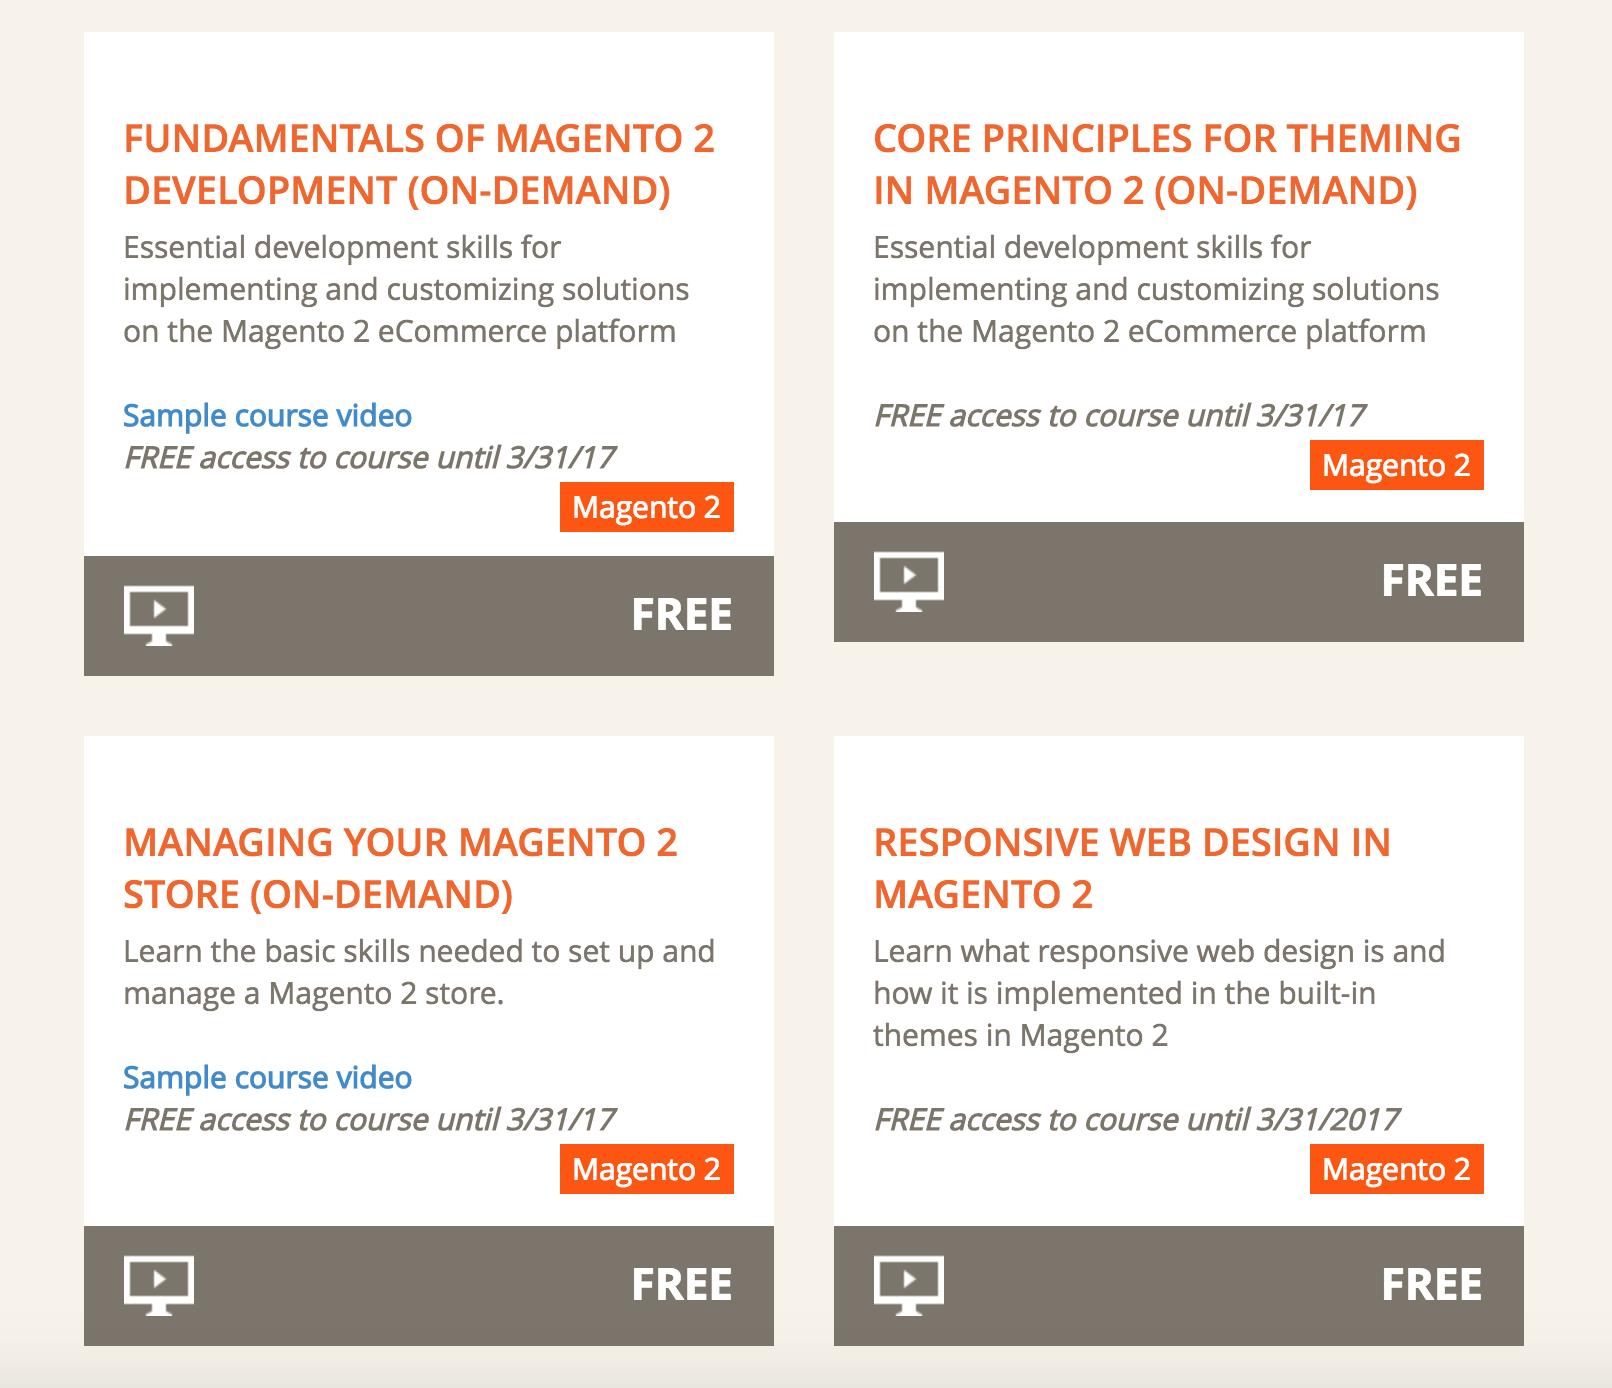 Magento U опубликовало бесплатный курс Fundamentals of Magento 2 Development